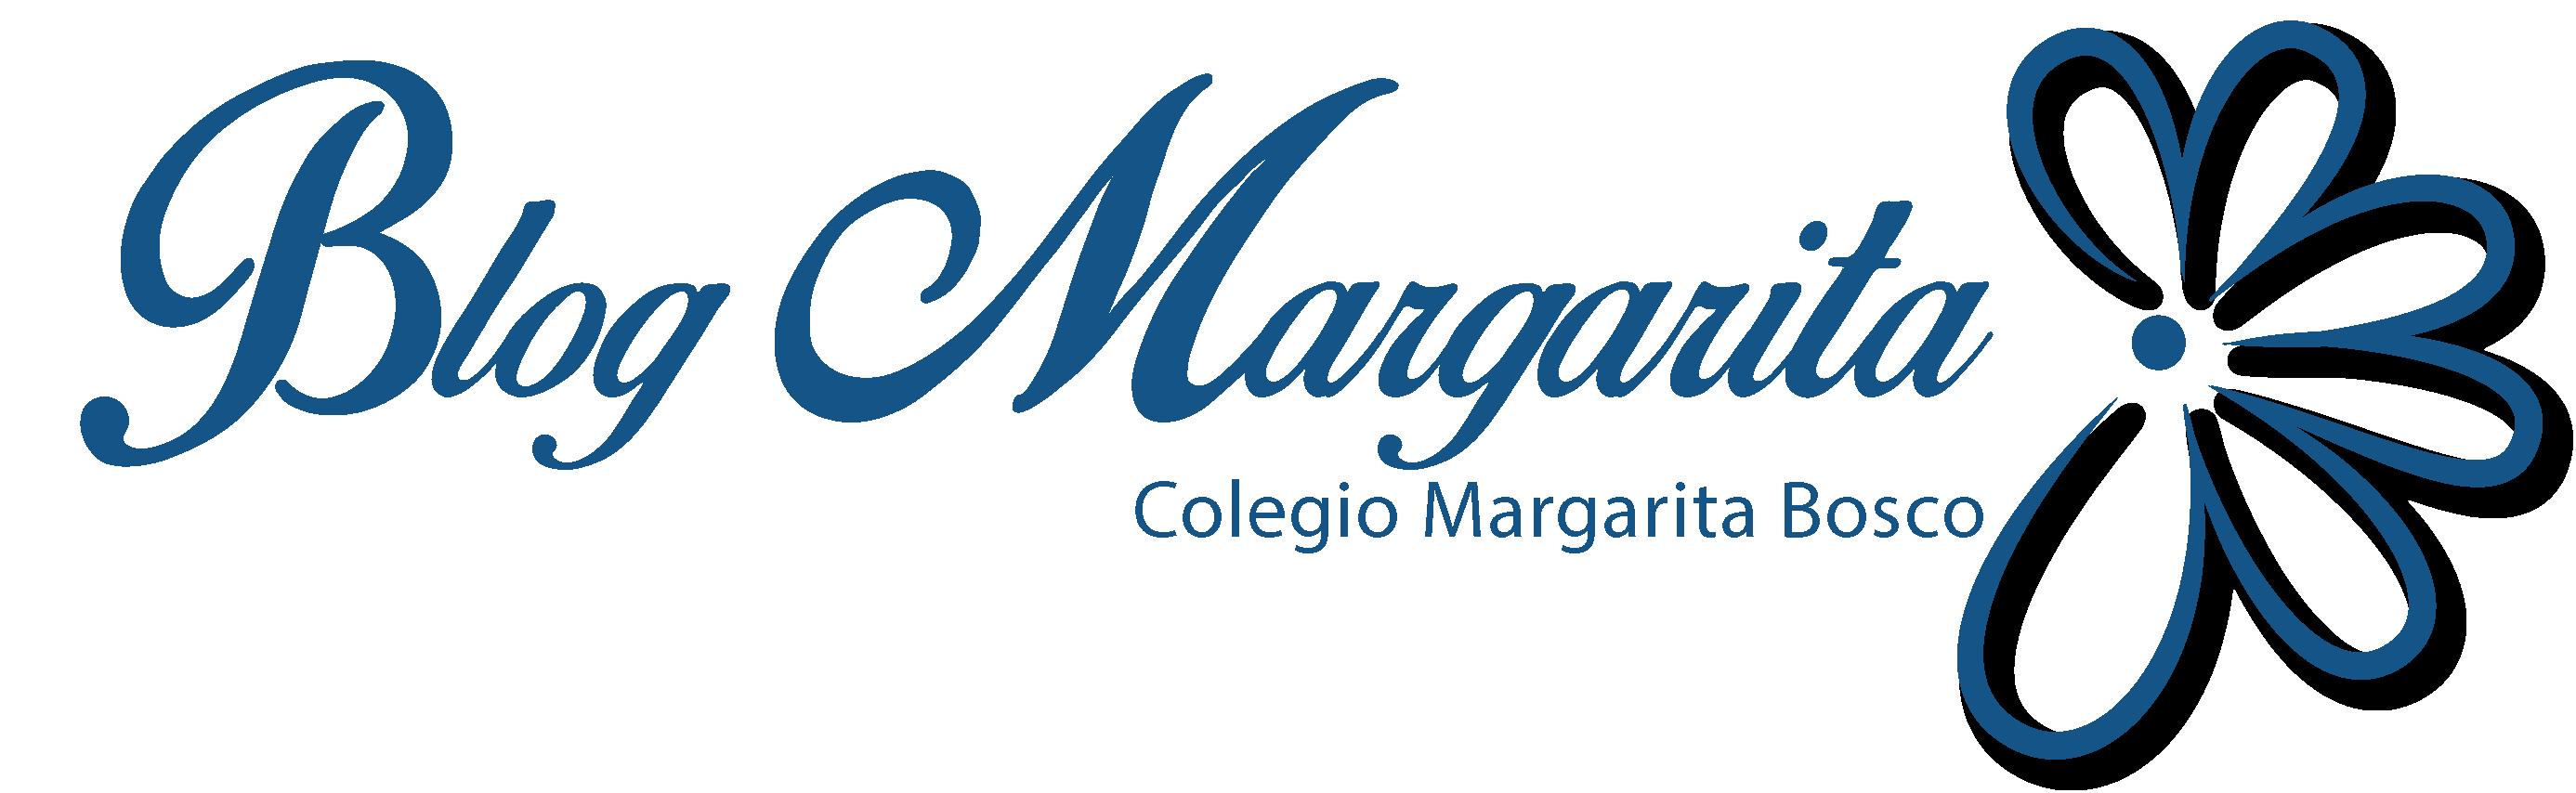 logo blog margarita2